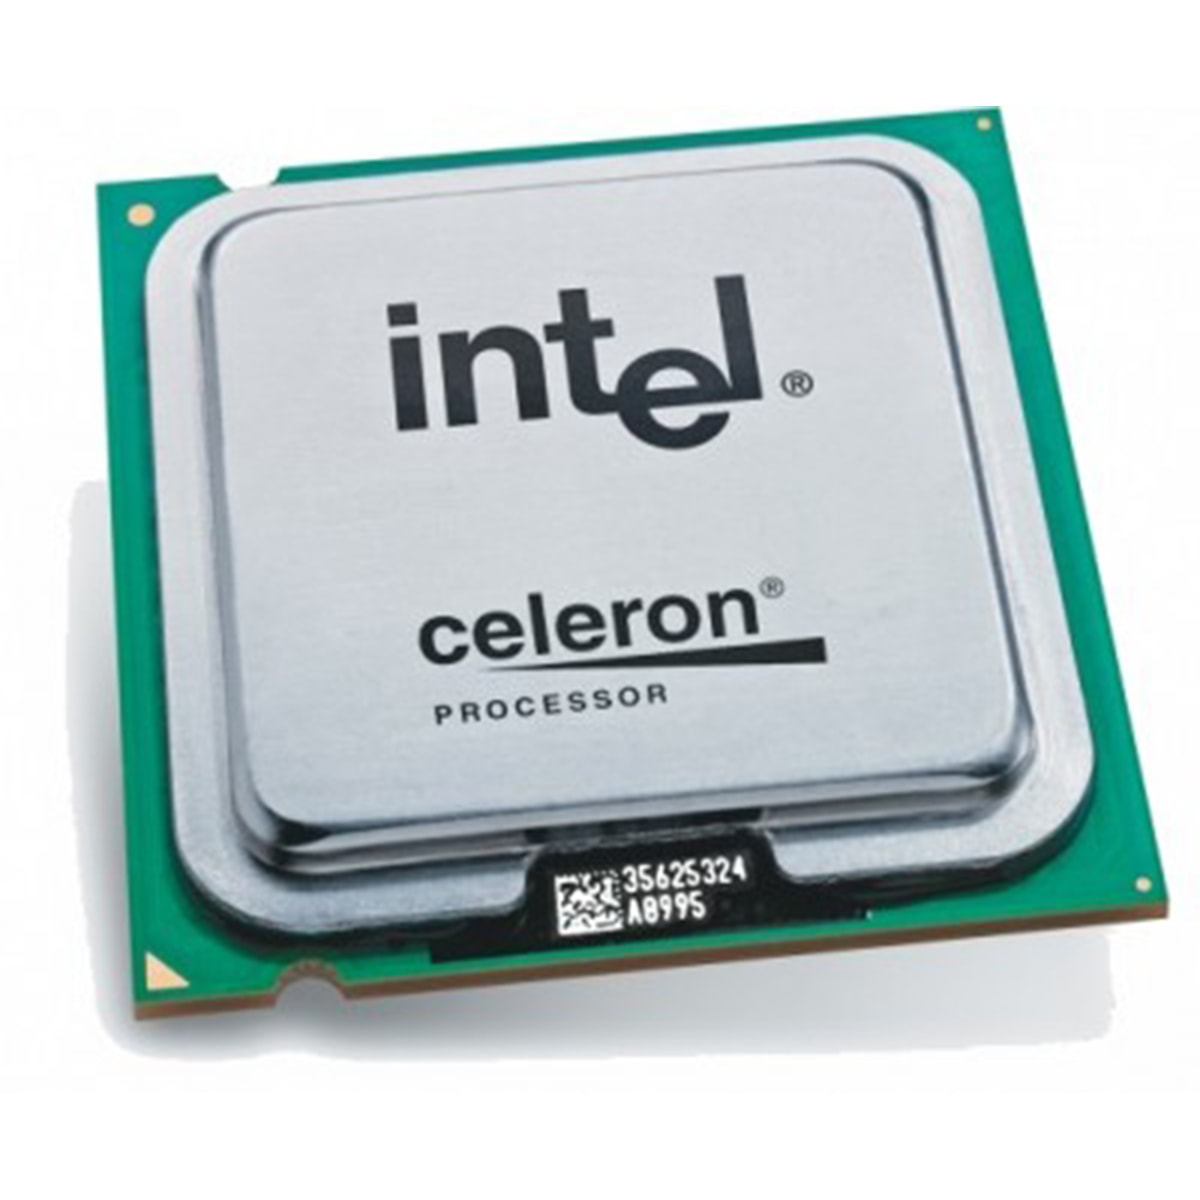 Processador Intel Celeron D 360 3,46 Ghz 512Kb Cache 533MHz - Socket 775 - Seminovo